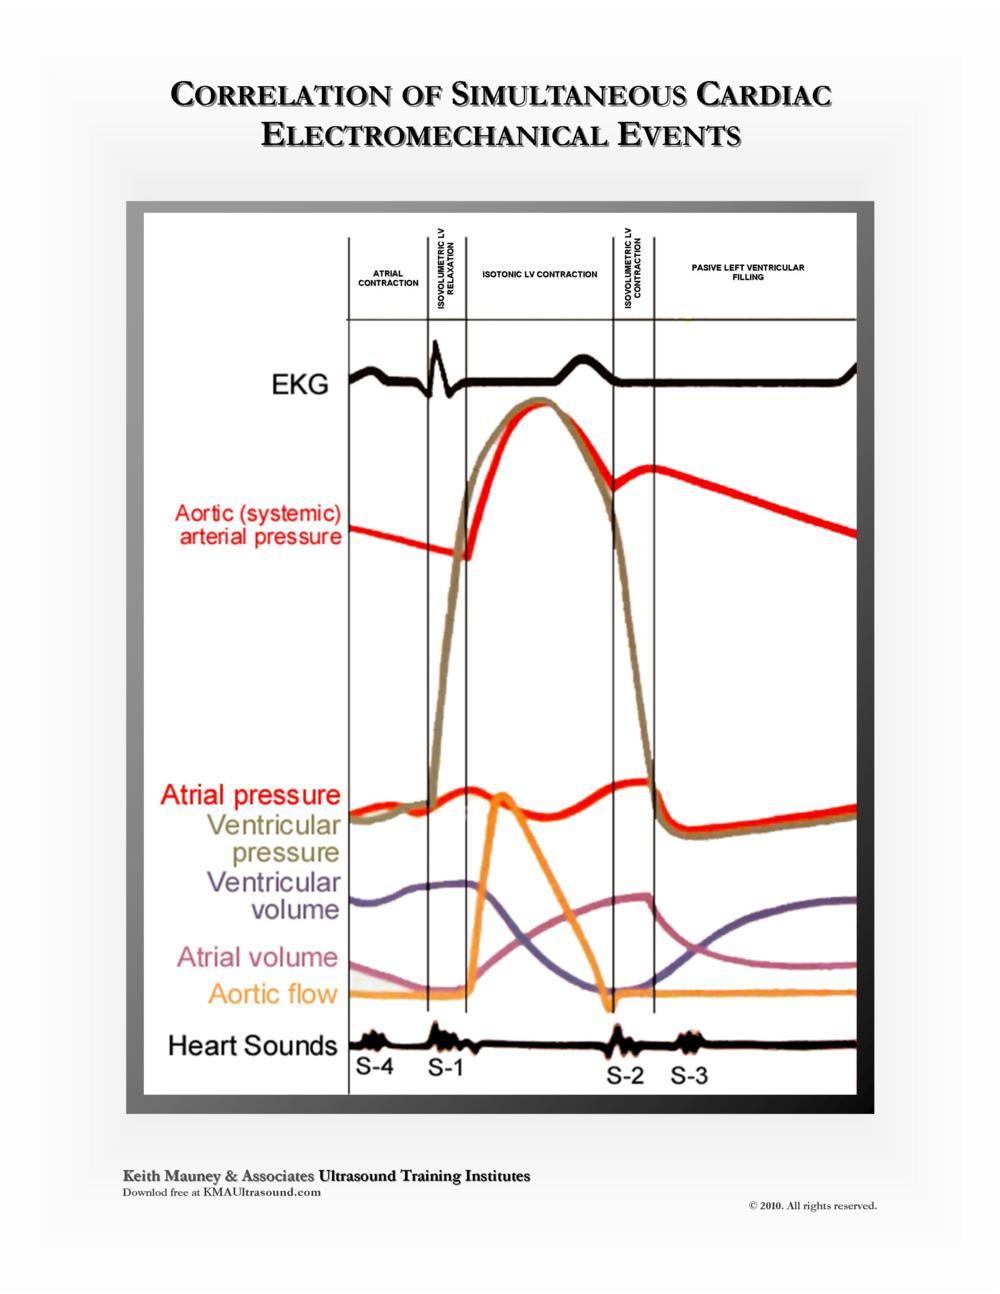 KMA Ultrasound Correlation of Simultaneous Cardiac Electromechanical Events